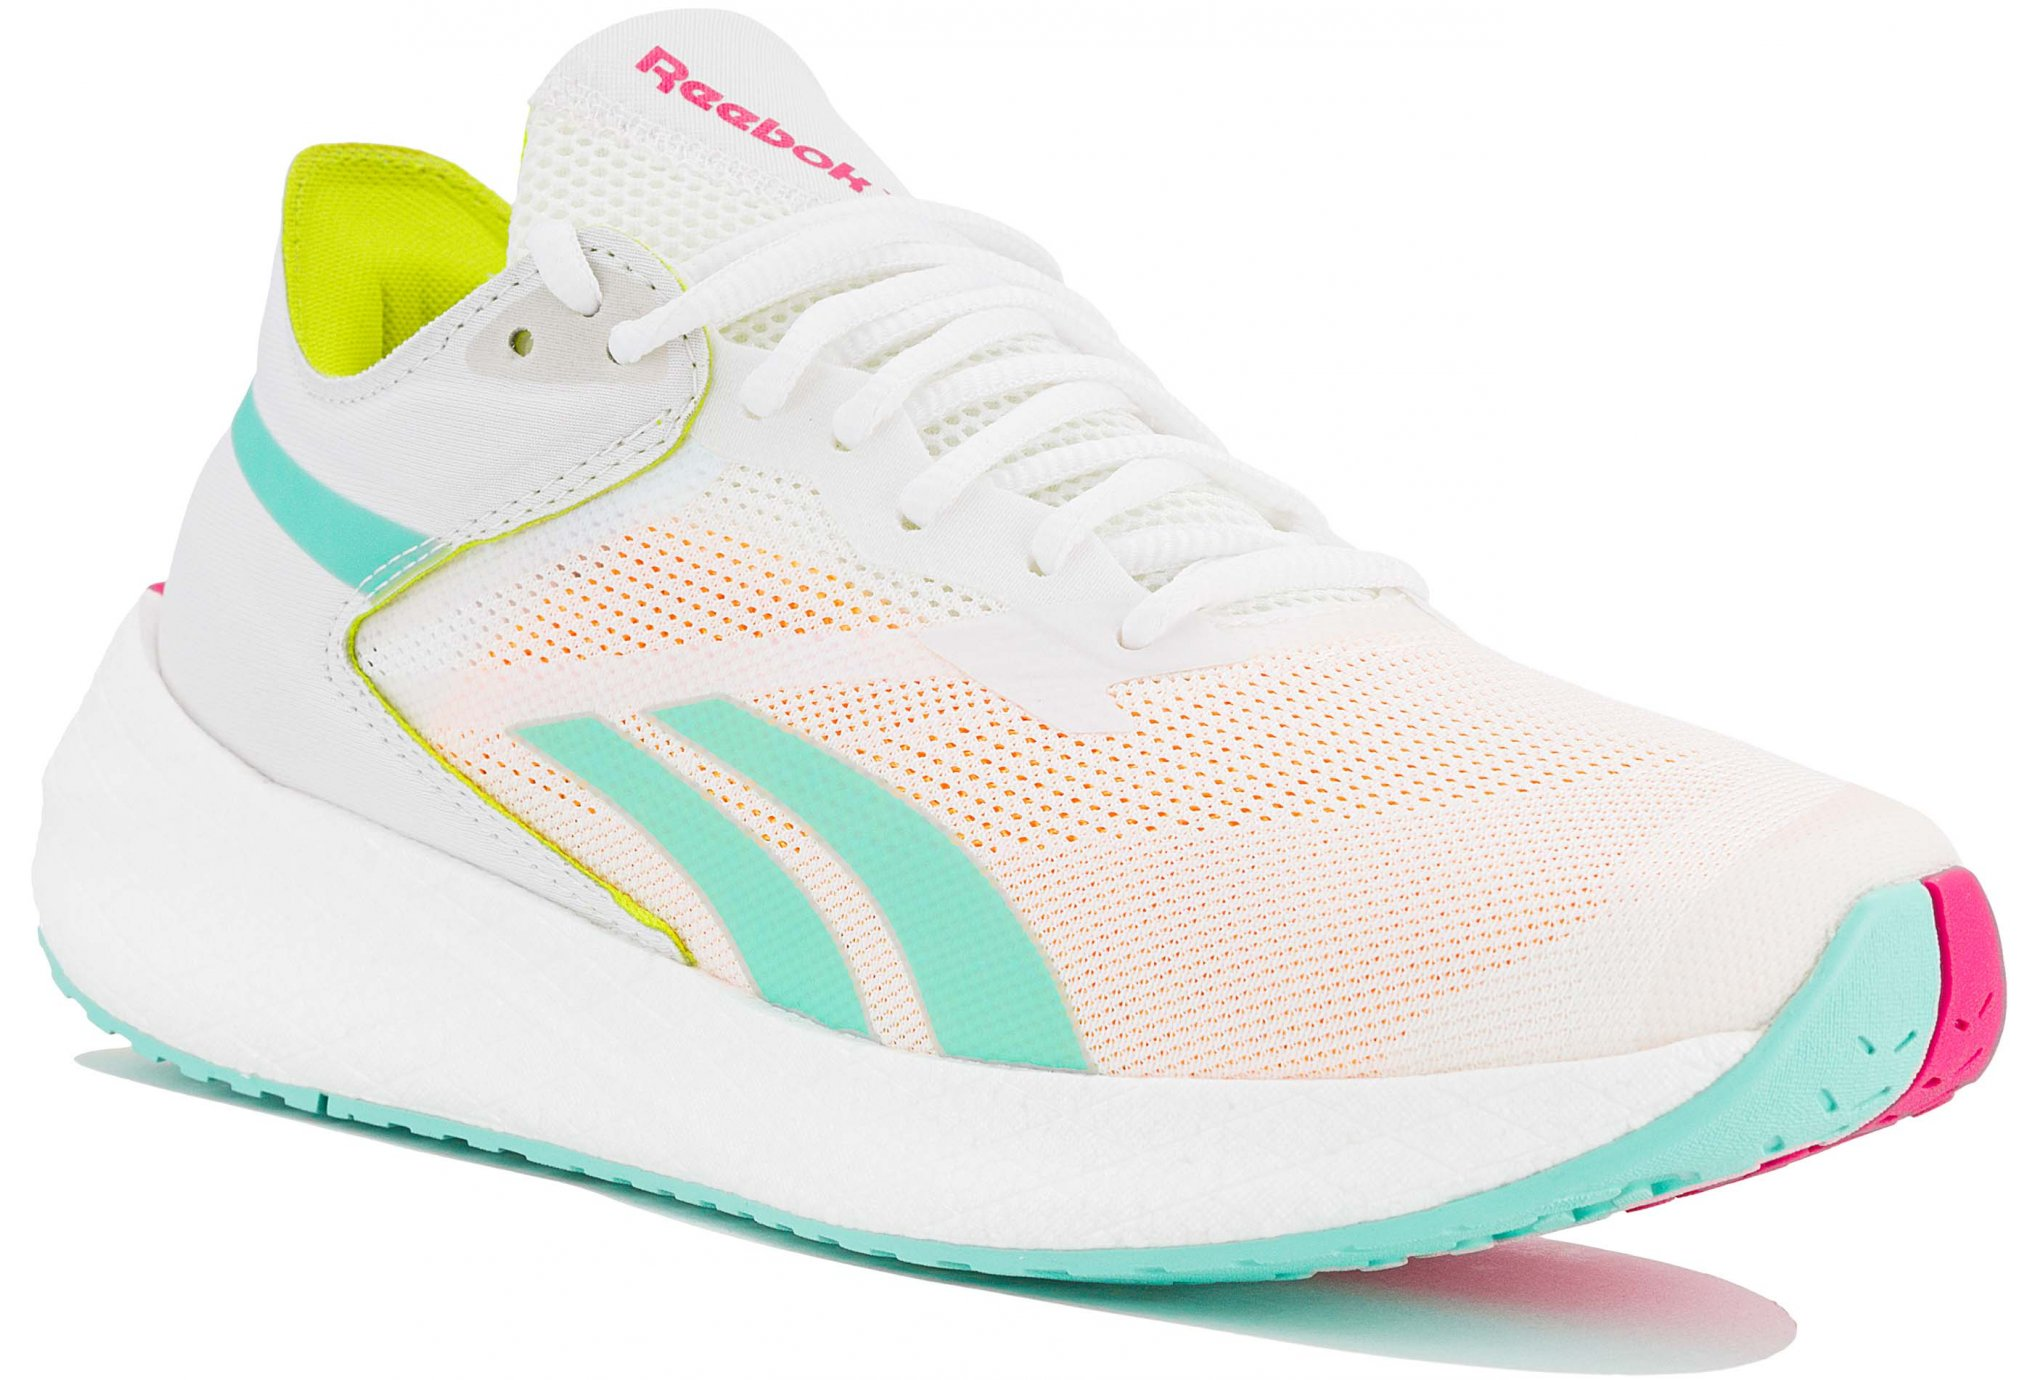 Reebok Floatride Energy Symmetros W Chaussures running femme